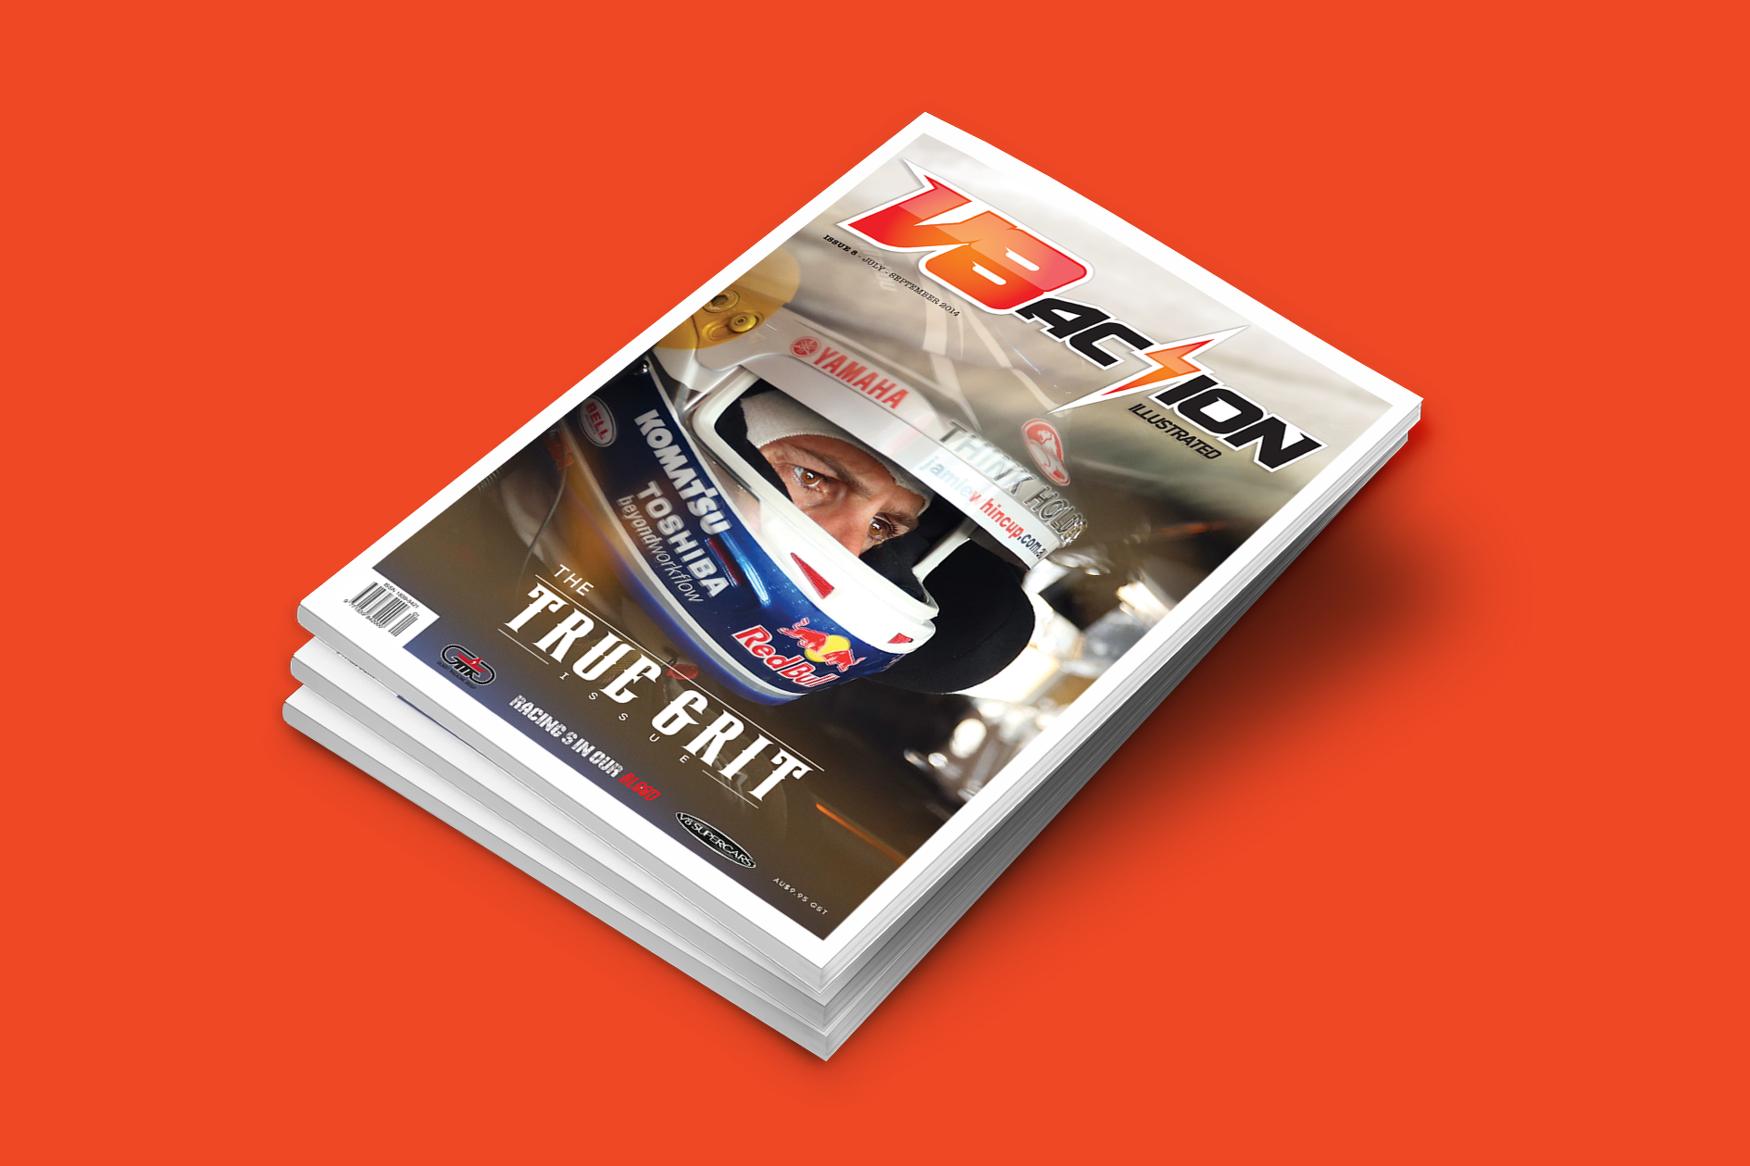 V8 Action Cover